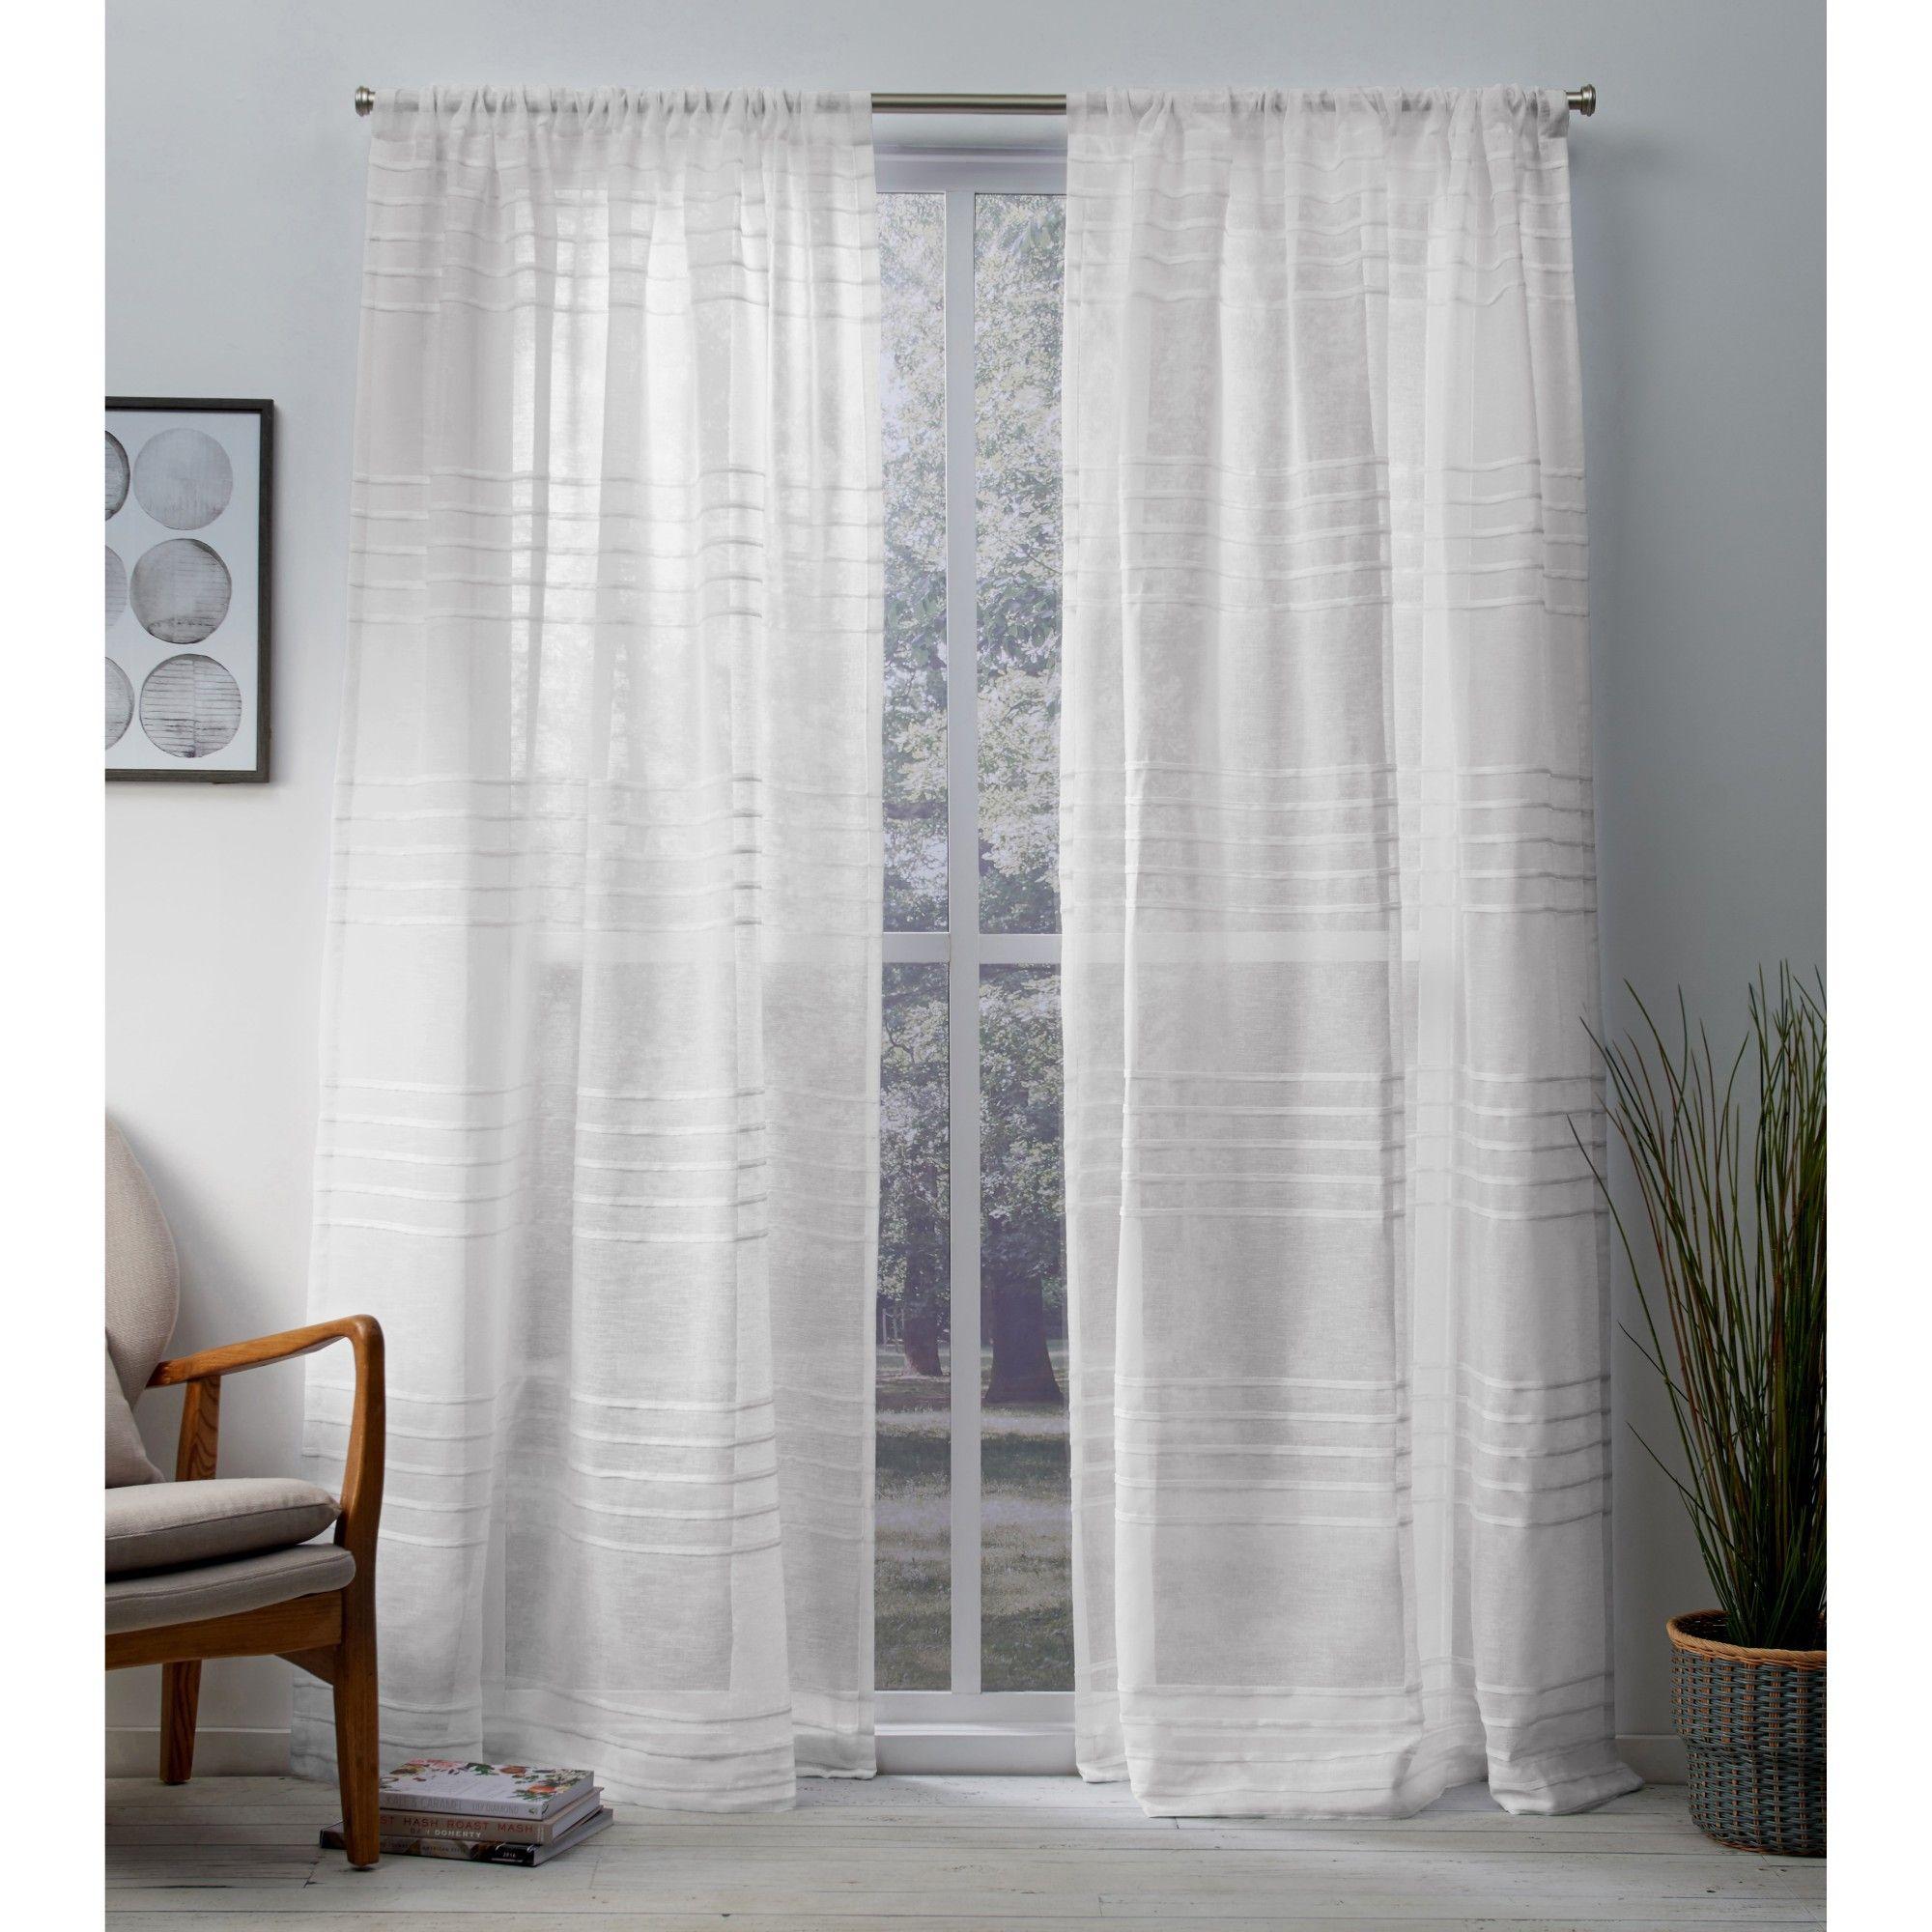 Monet Sheer Linen Pleated Cabana Stripe Rod Pocket Window Curtain Panel Pair Winter White 54x108 Exclusive Home Rod Pocket Curtains Panel Curtains Curtains